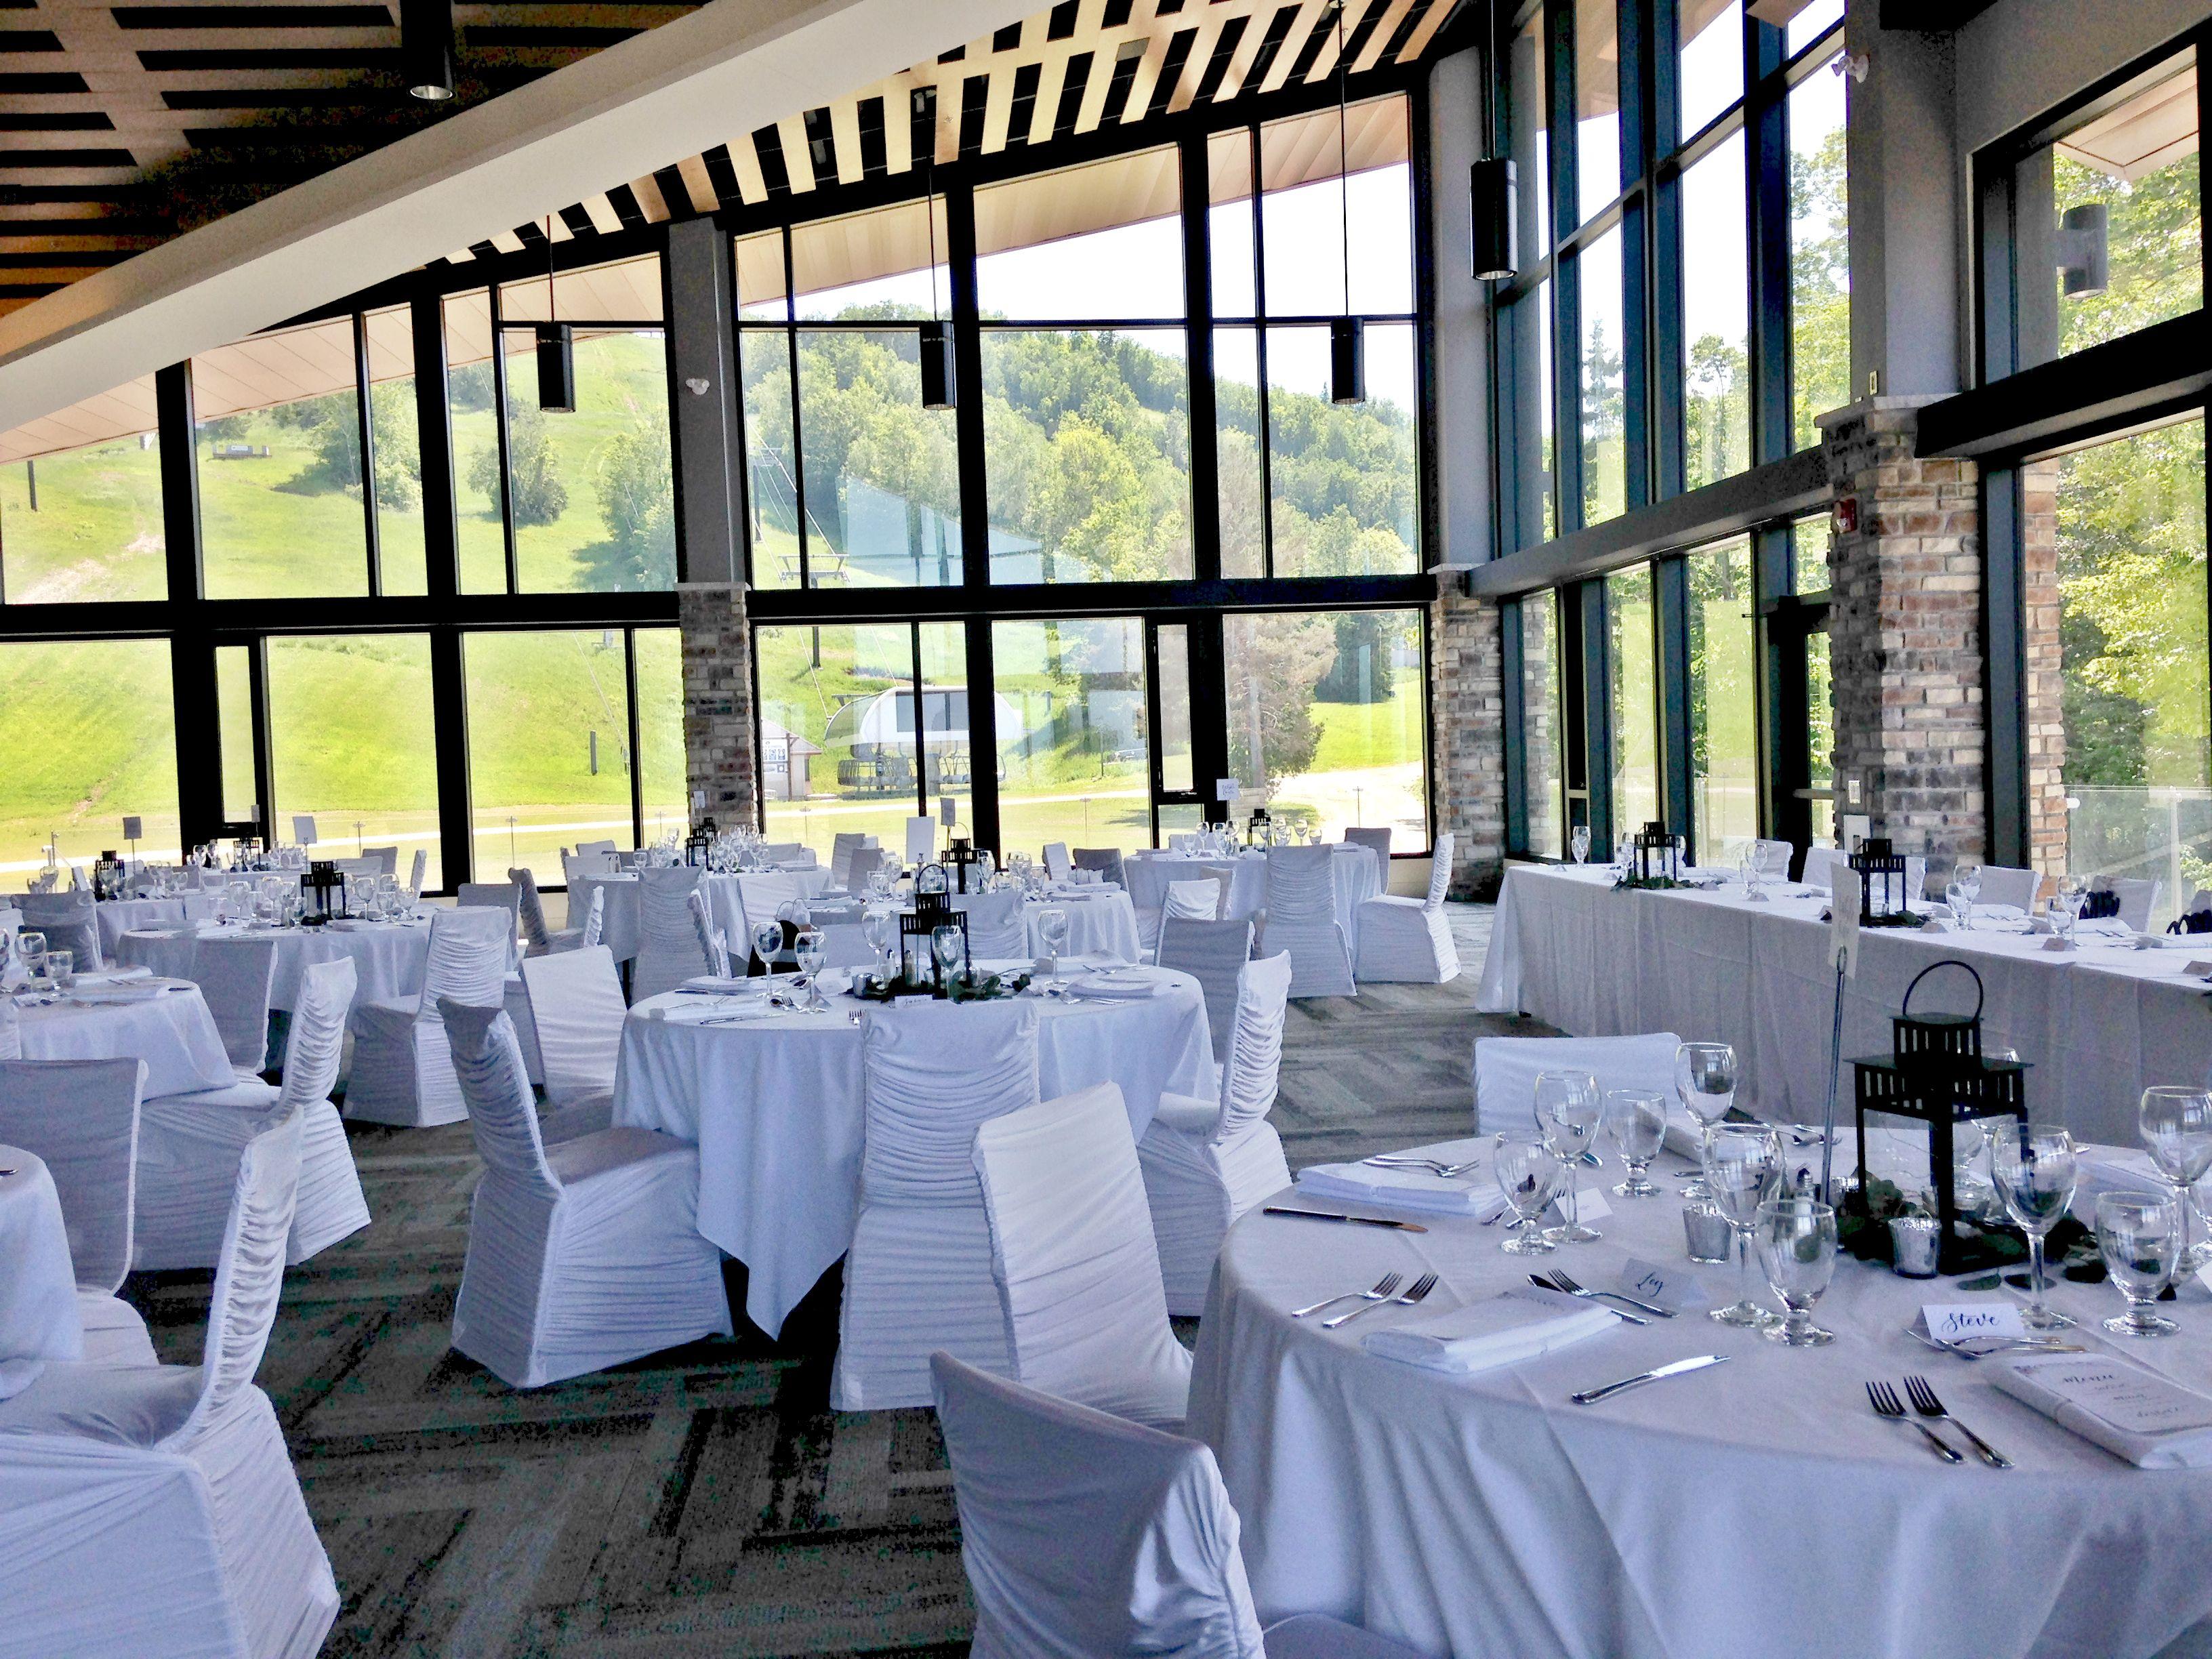 Wedding Event Venue In Georgian Bay Alpine Ski Club The Blue Mountains